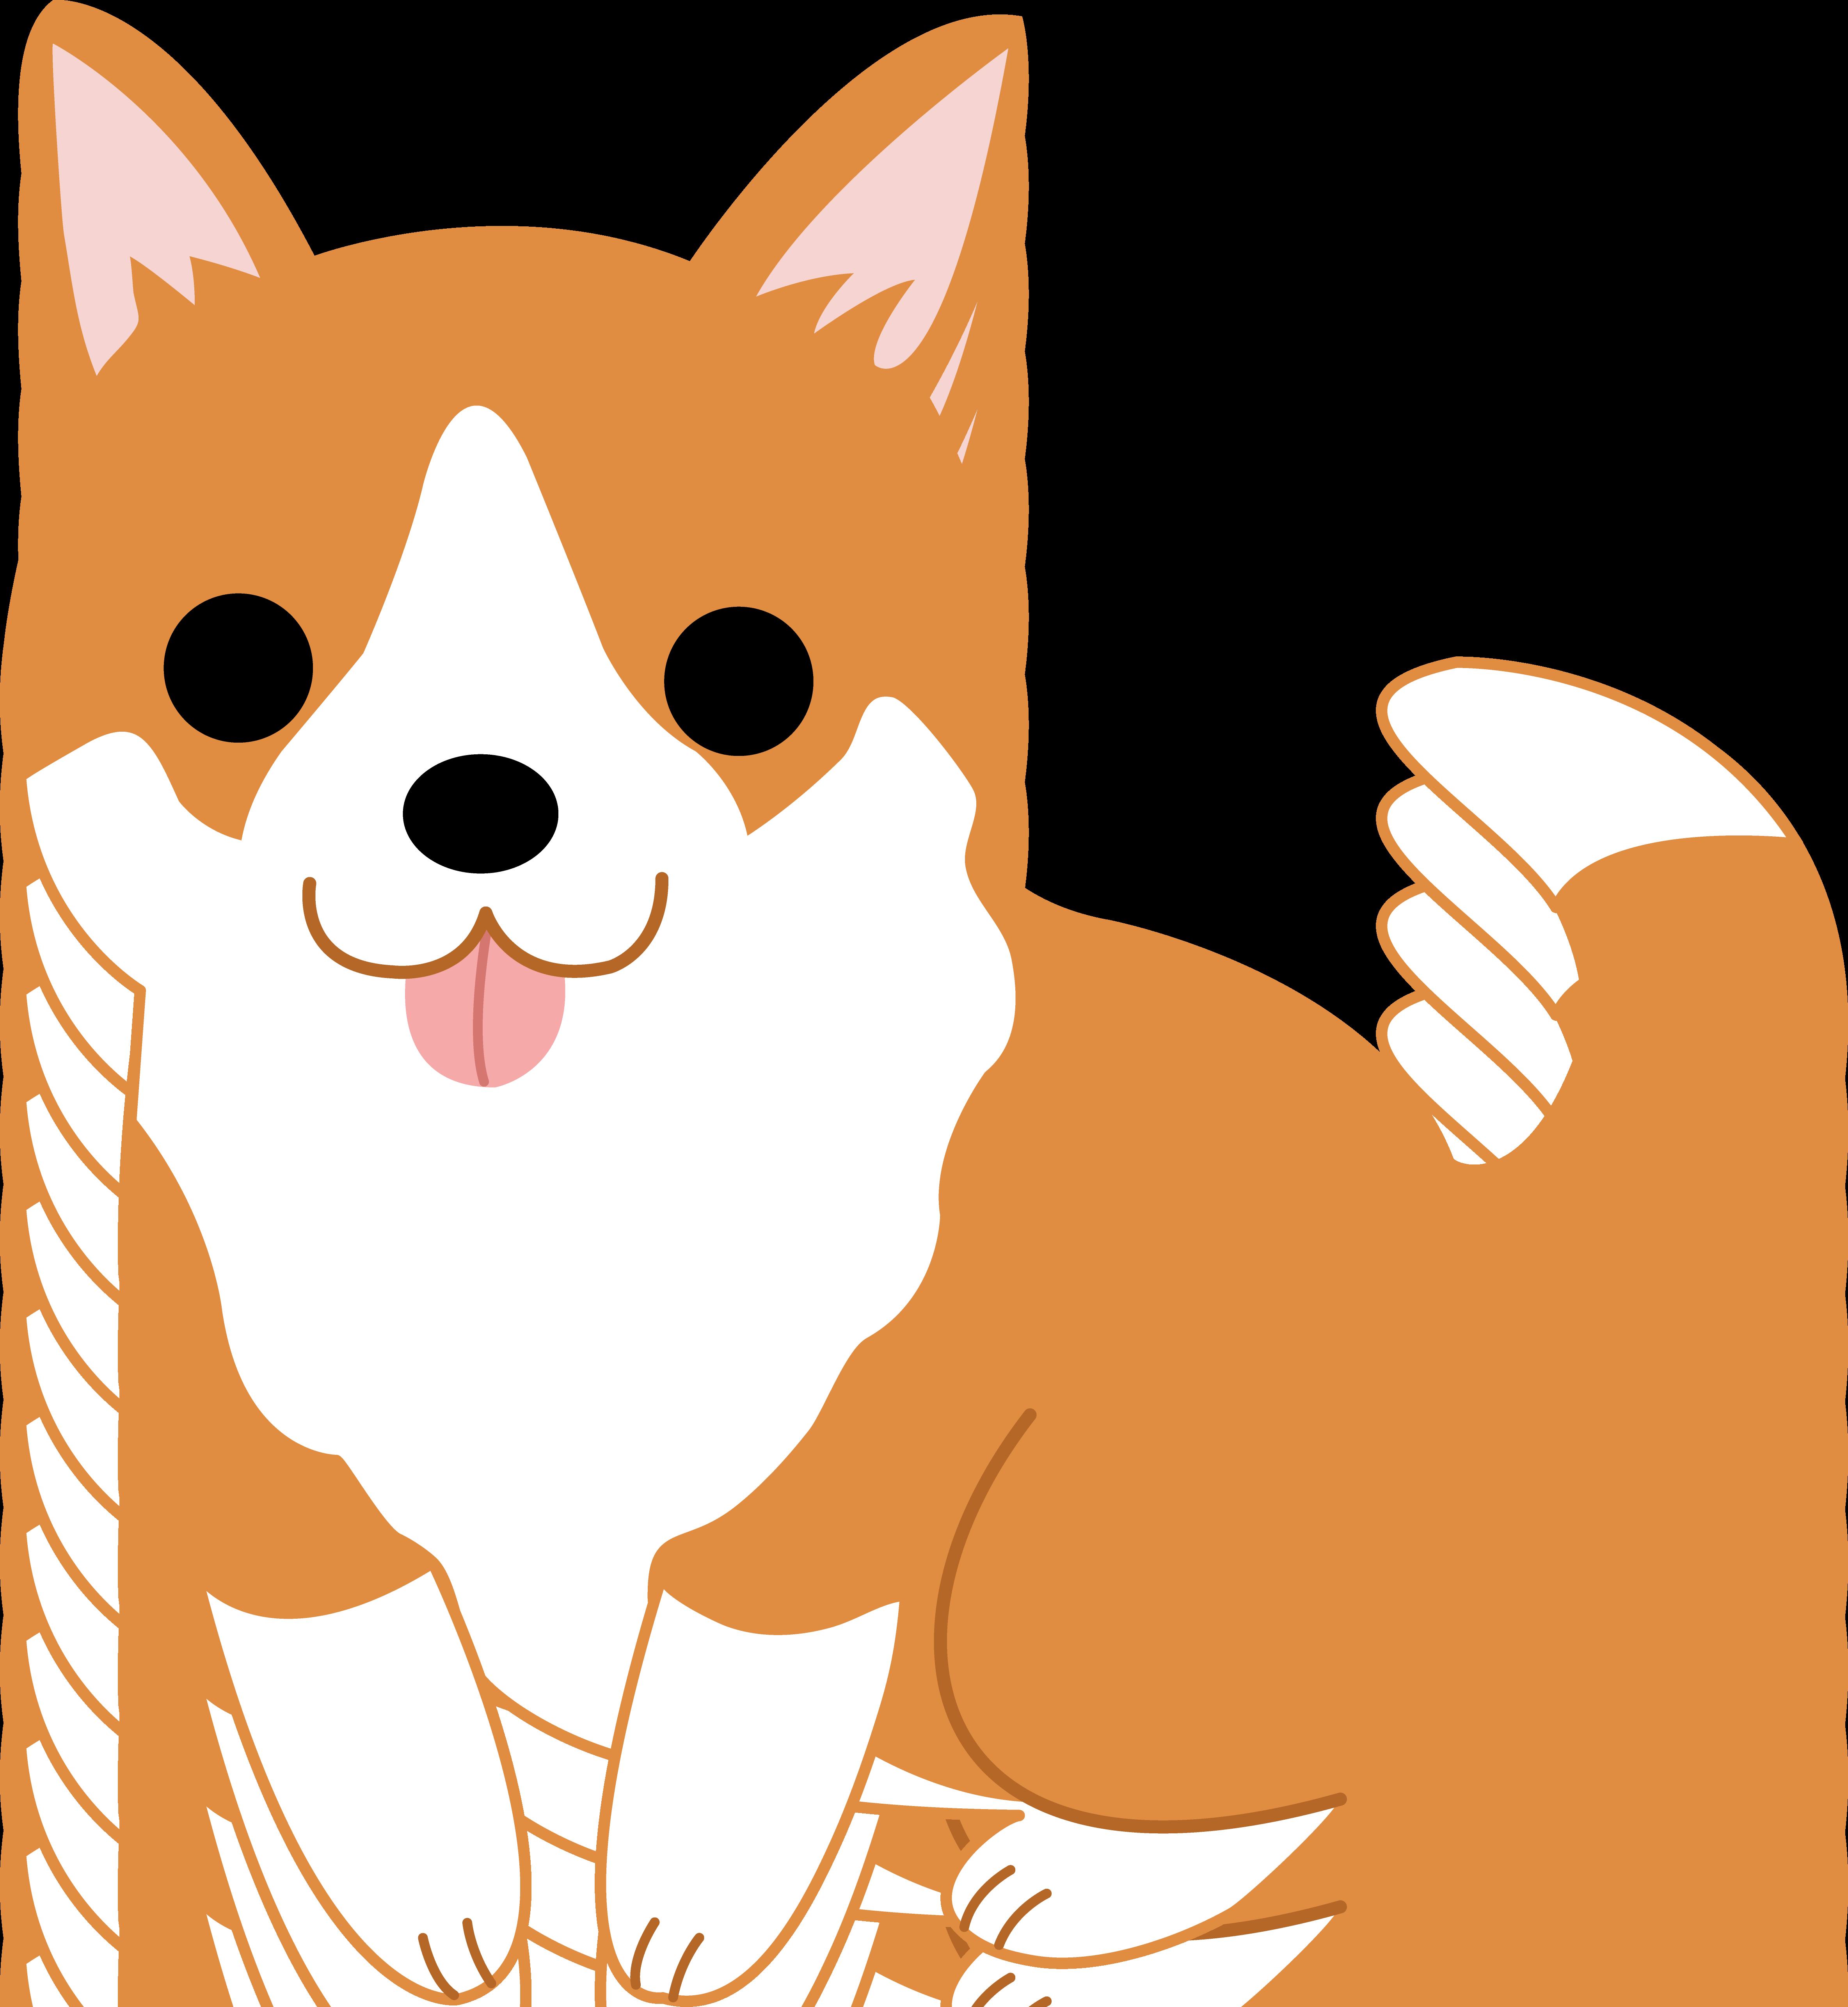 Cute Dog Face Clip Art | Clipart Panda - Free Clipart Images